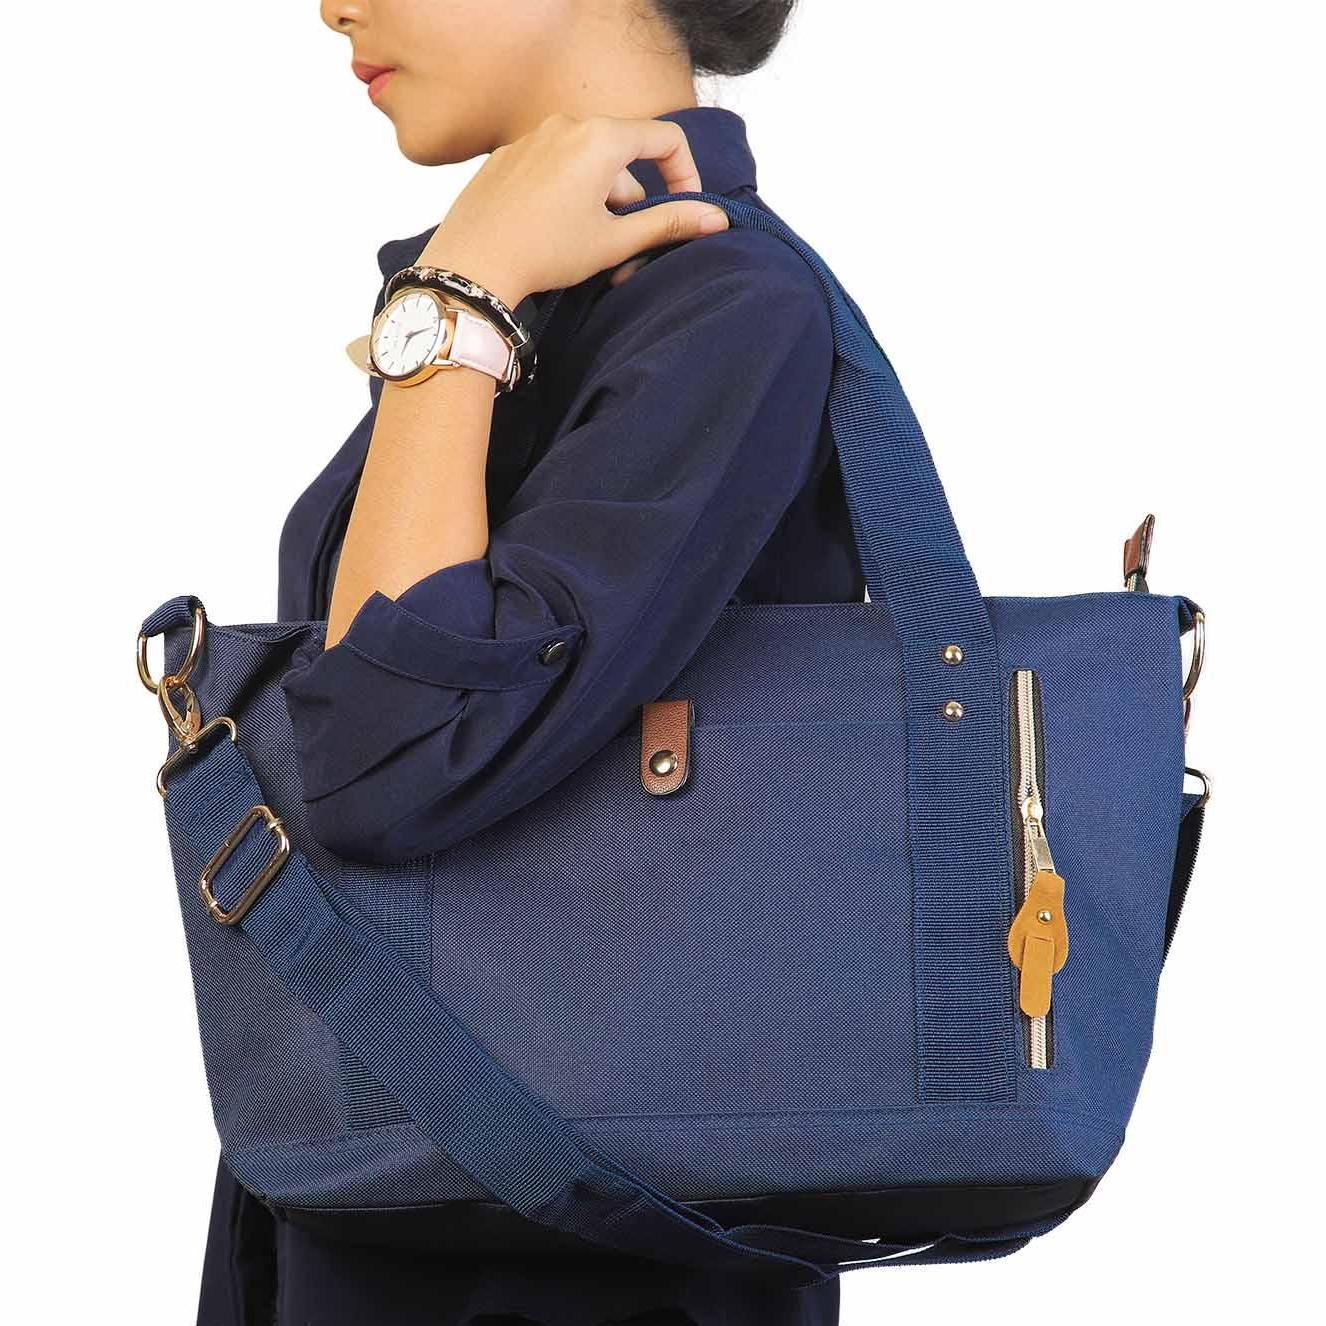 Eloria Promo Tas Wanita Traveling Casual Selempang Fashion Shopping Tote  Bag Korean Import - Navy Blue b2d43364cd